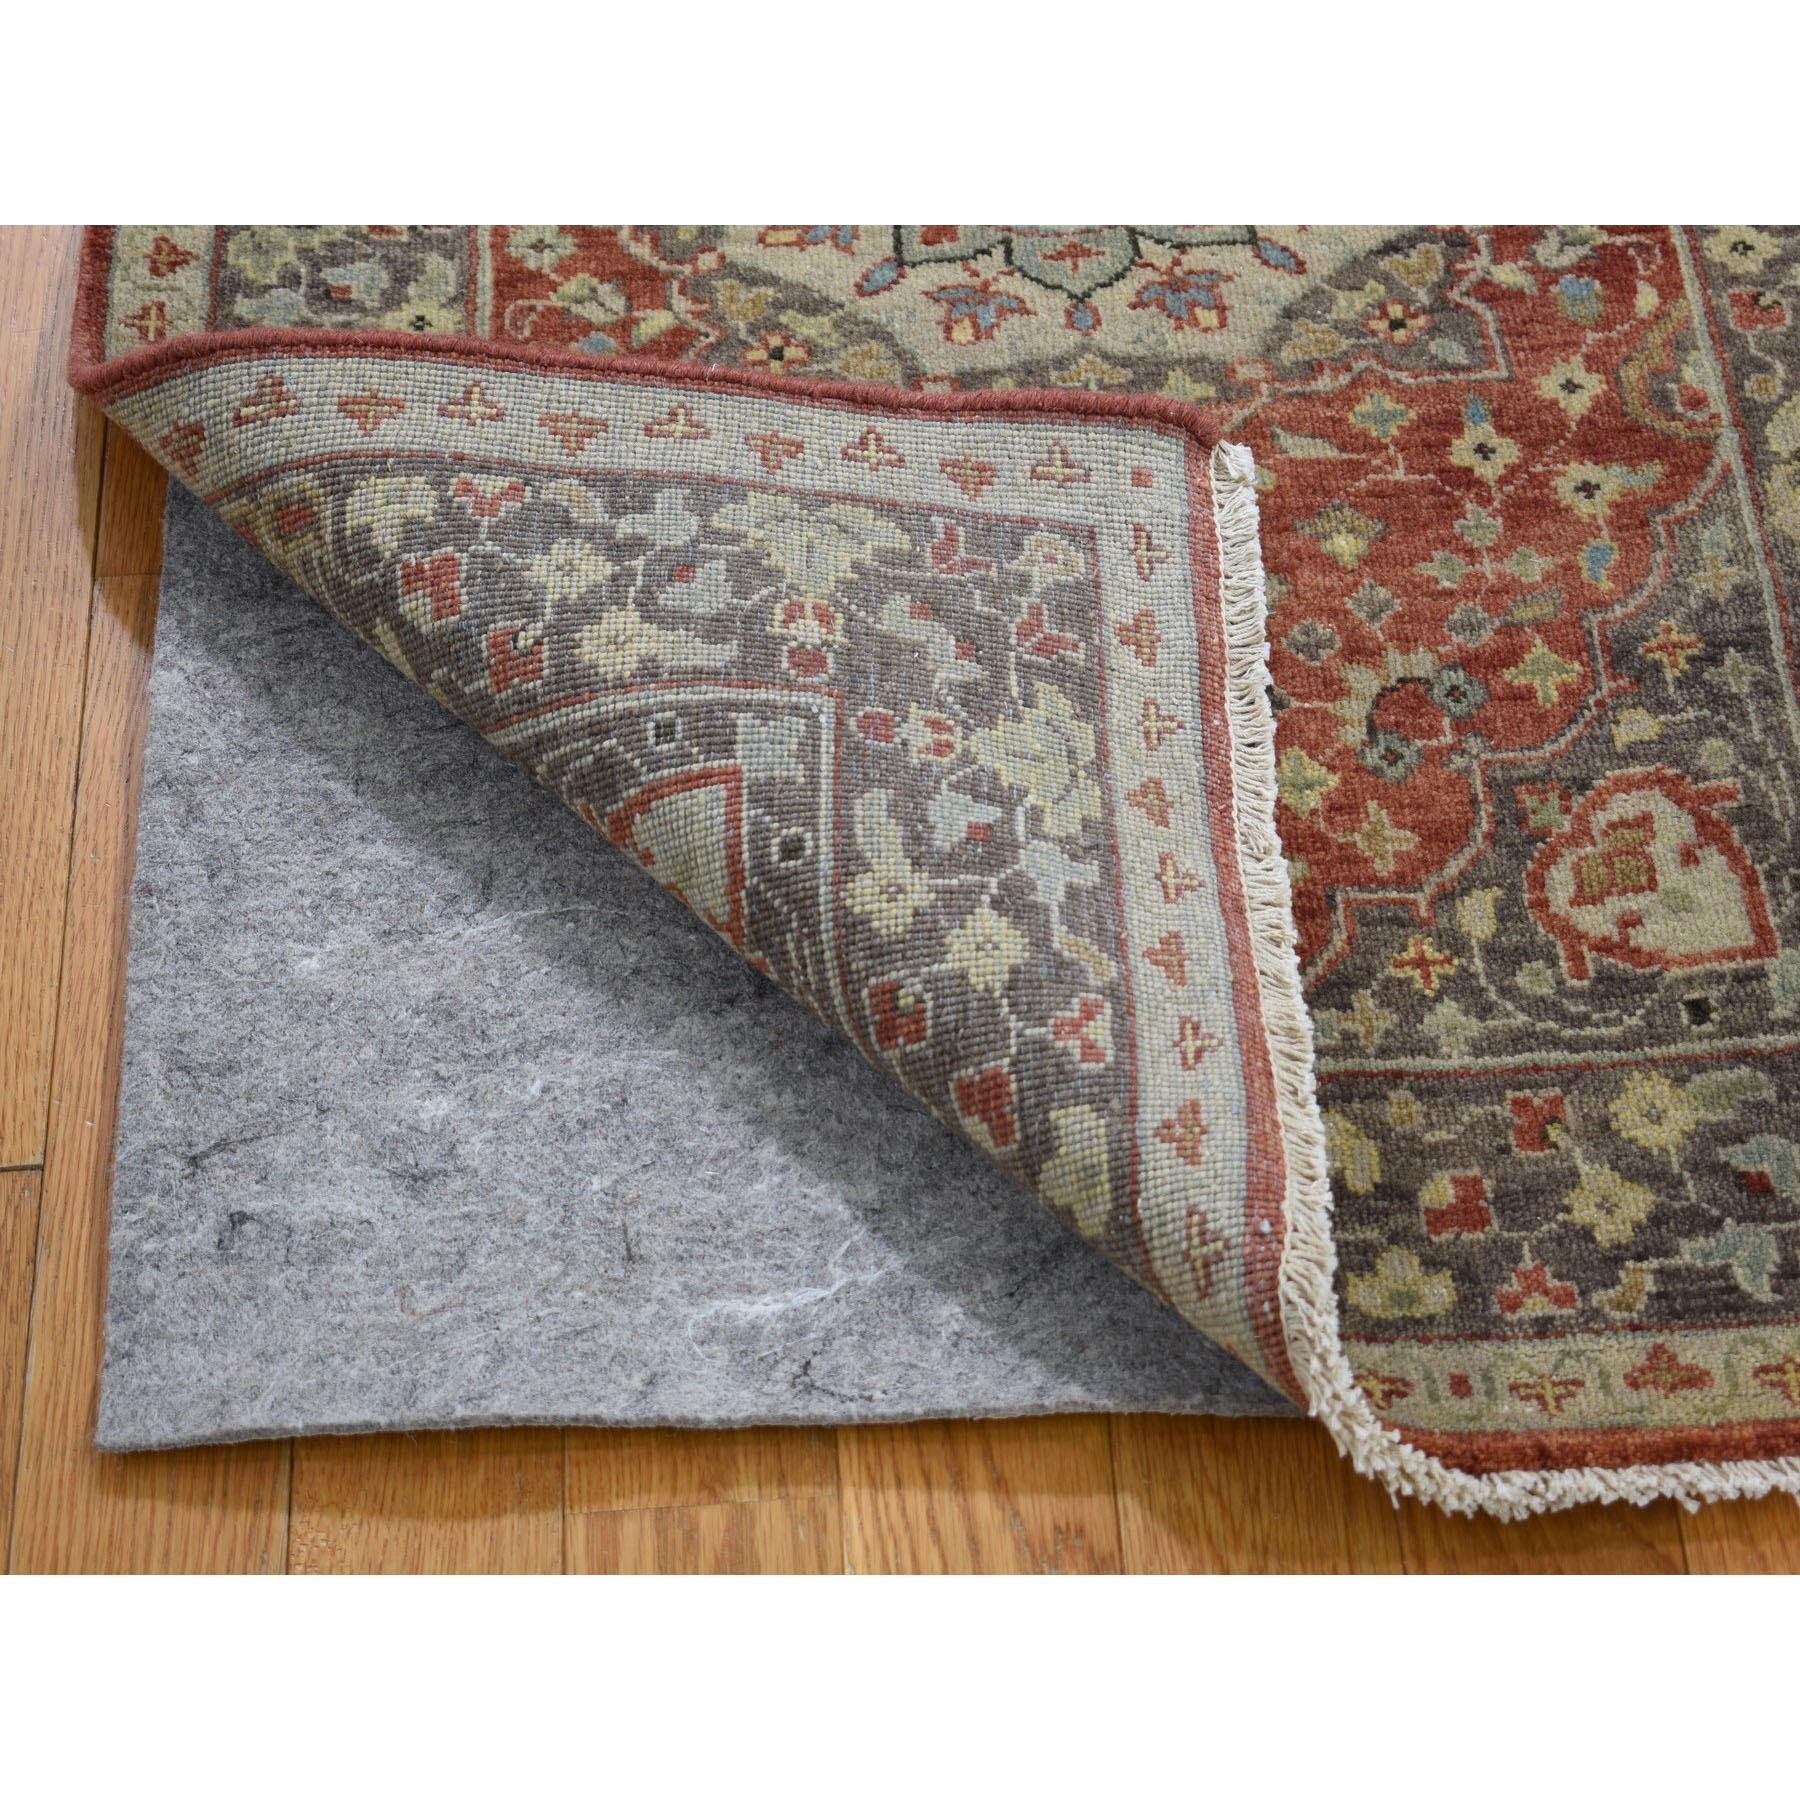 "2'6""x15'10""  Hand Knotted XL Runner Antiqued Tabriz Haji Jalili Re-Creation Oriental Rug"